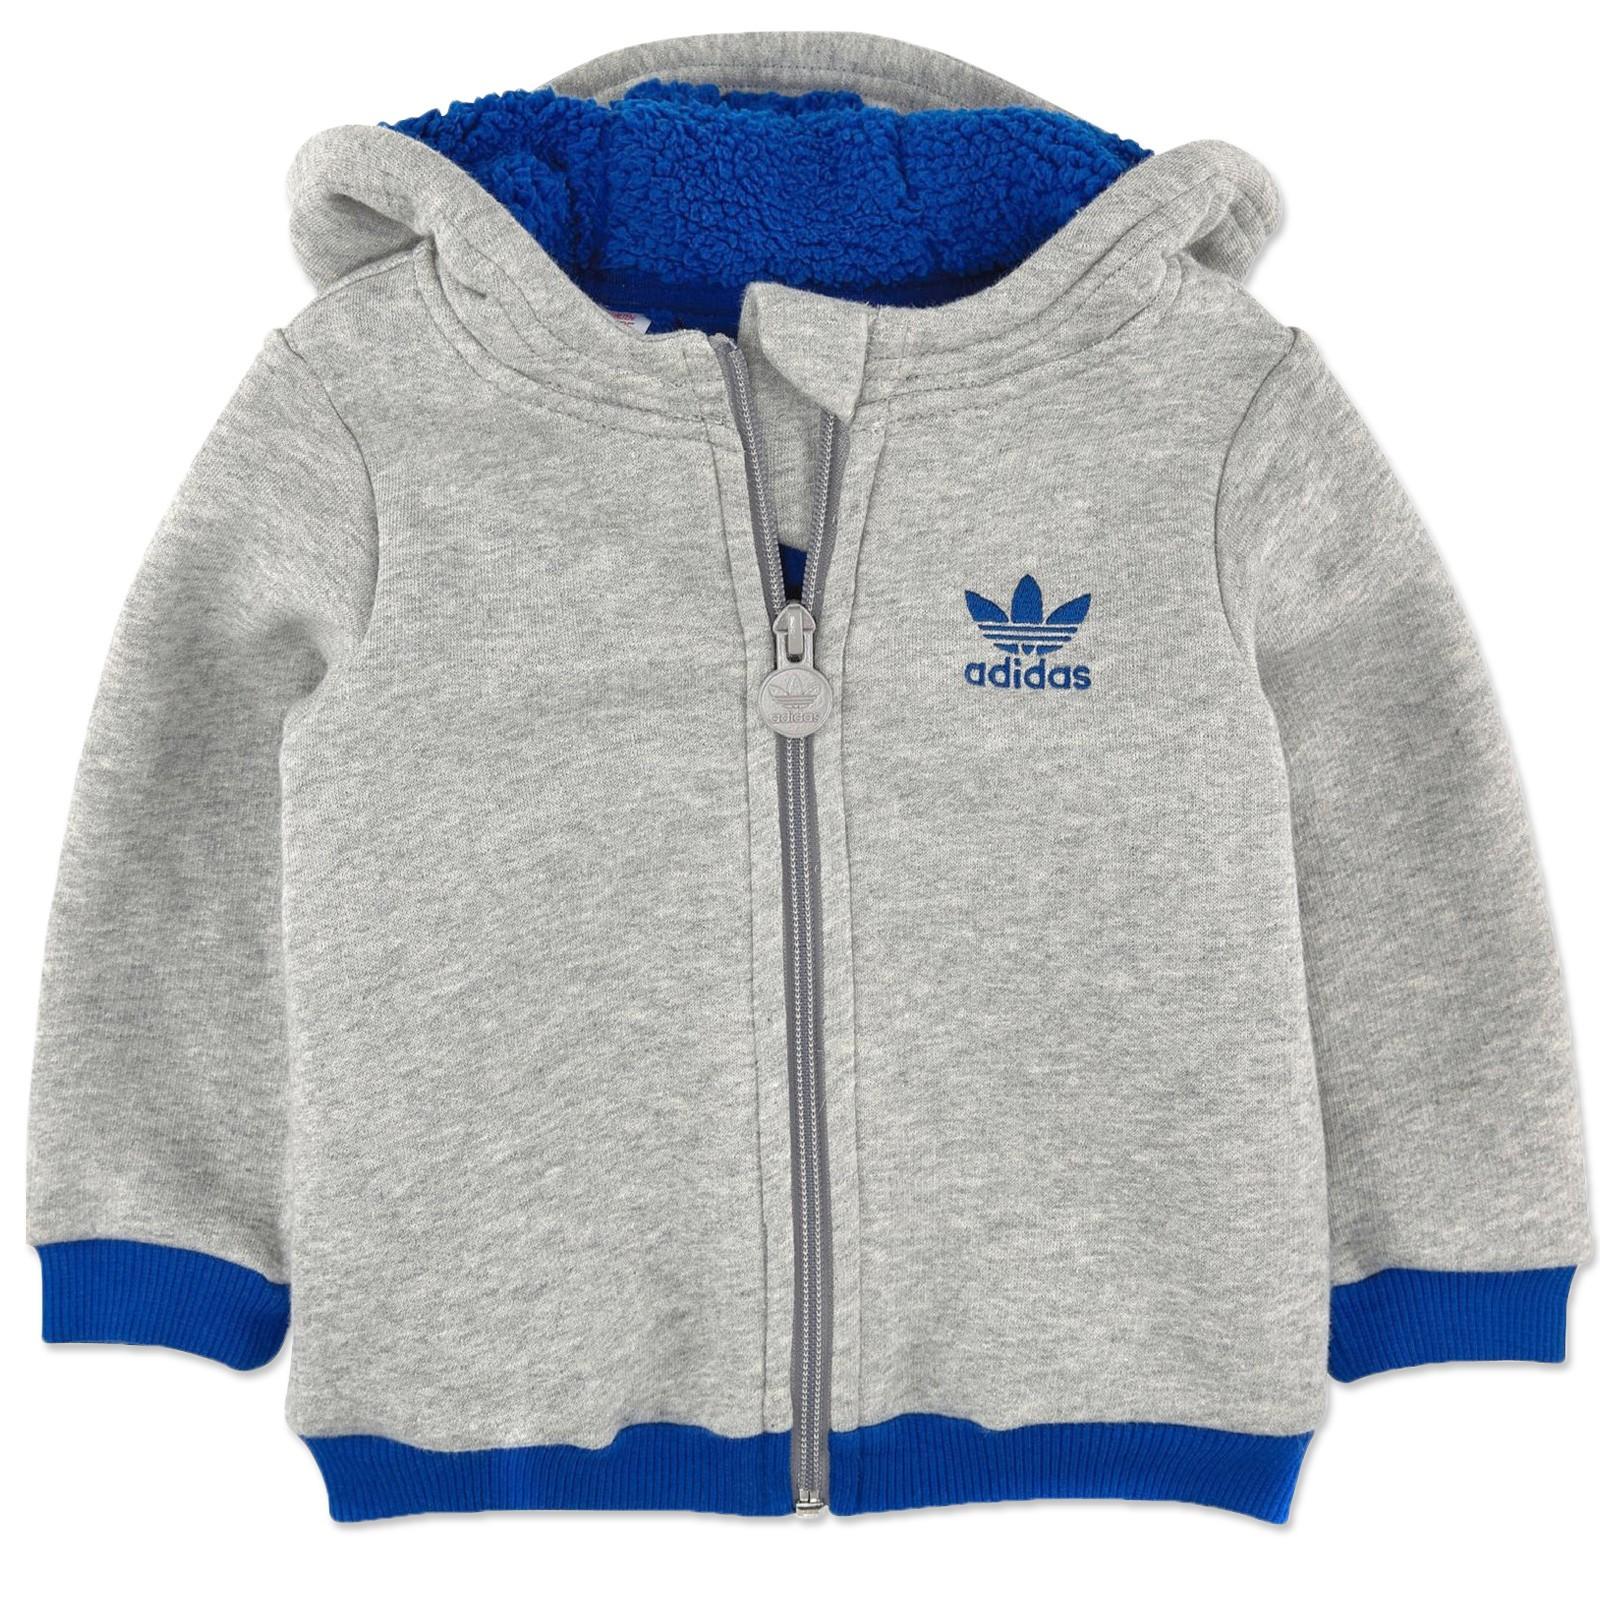 adidas baby winter teddy jacke kinder sweatshirt gef ttert. Black Bedroom Furniture Sets. Home Design Ideas